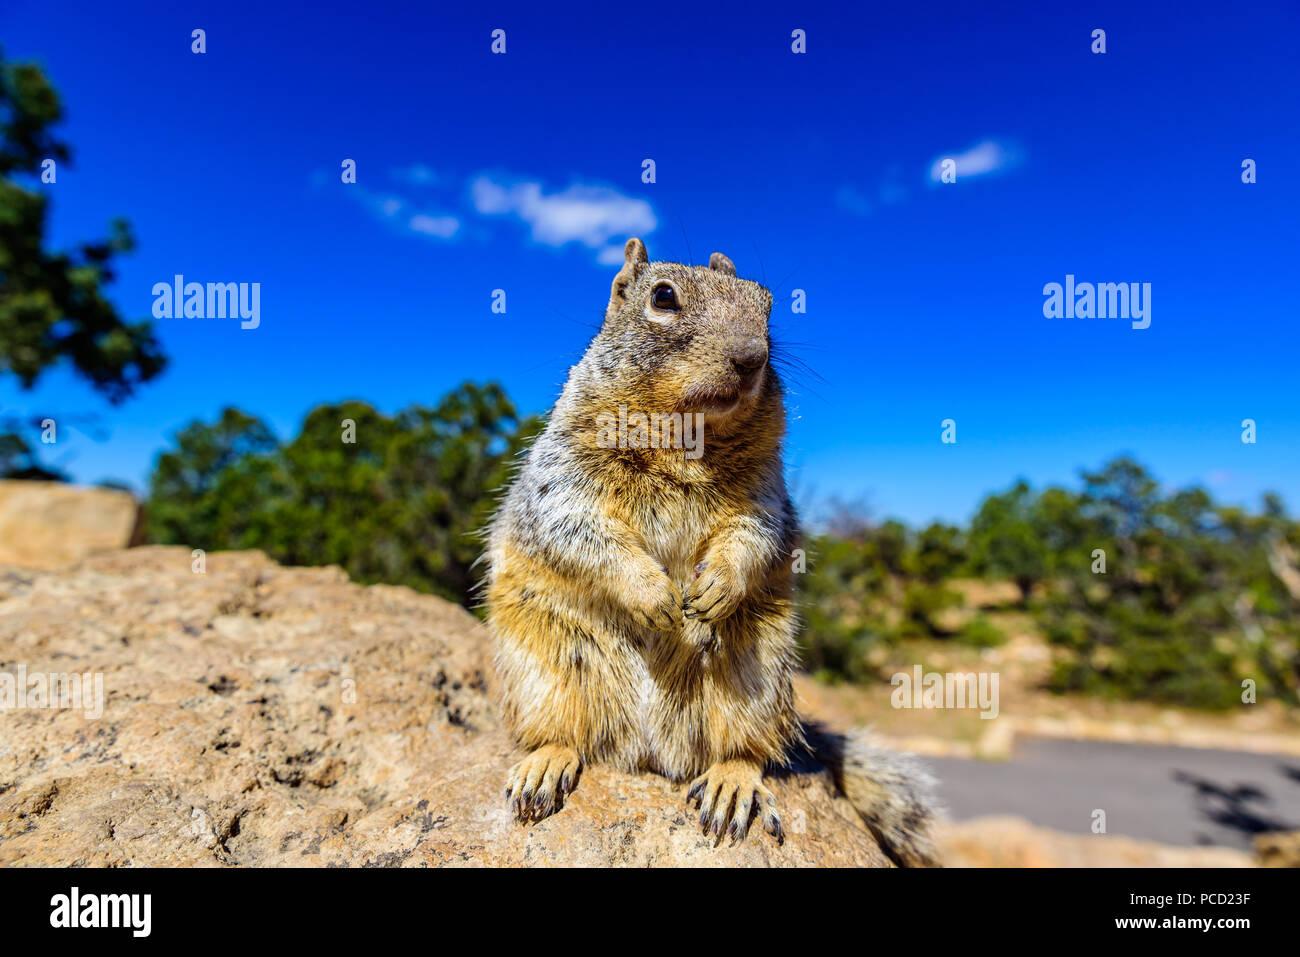 Kaibab squirrel at the Grand Canyon, in northern Arizona, USA - Stock Image